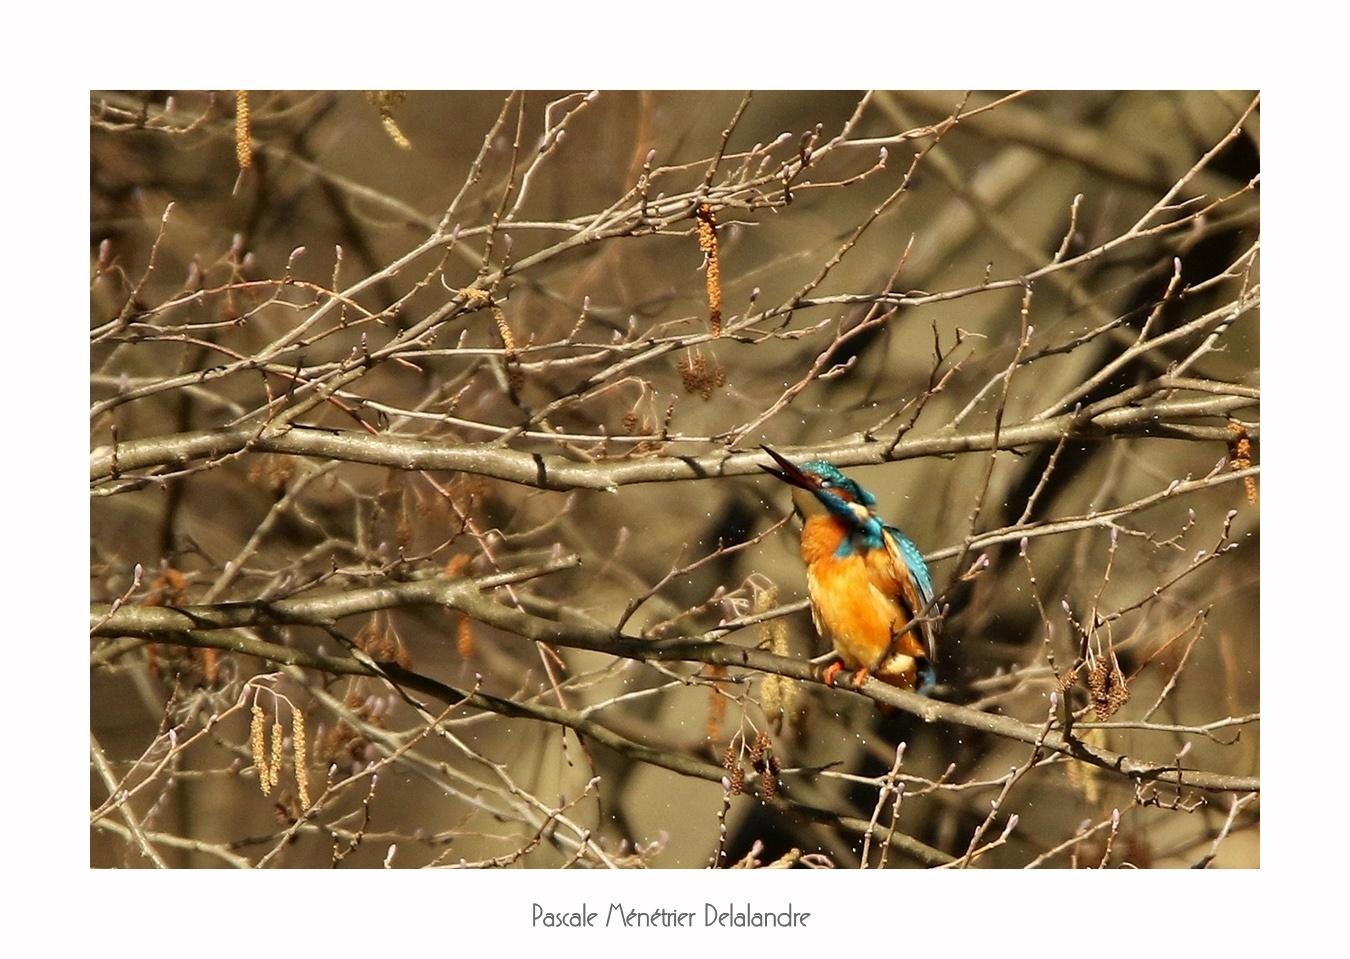 Un martin pêcheur qui aime l'altitude... perché dans un arbre.